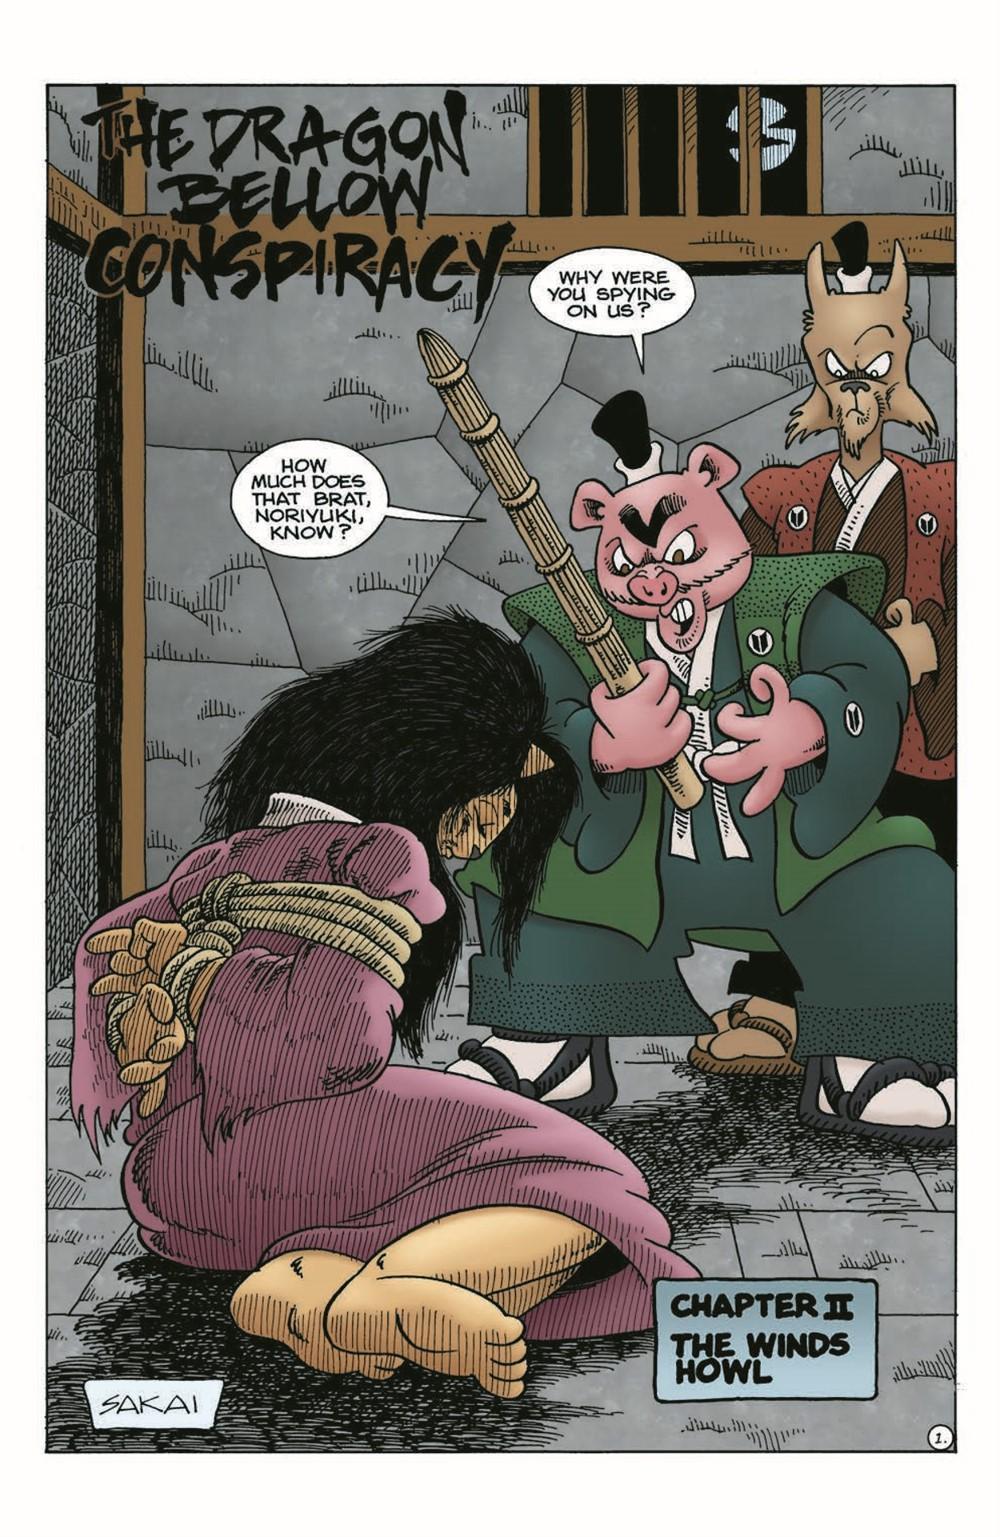 Usagi-DBC02_pr-3 ComicList Previews: USAGI YOJIMBO THE DRAGON BELLOW CONSPIRACY #2 (OF 6)